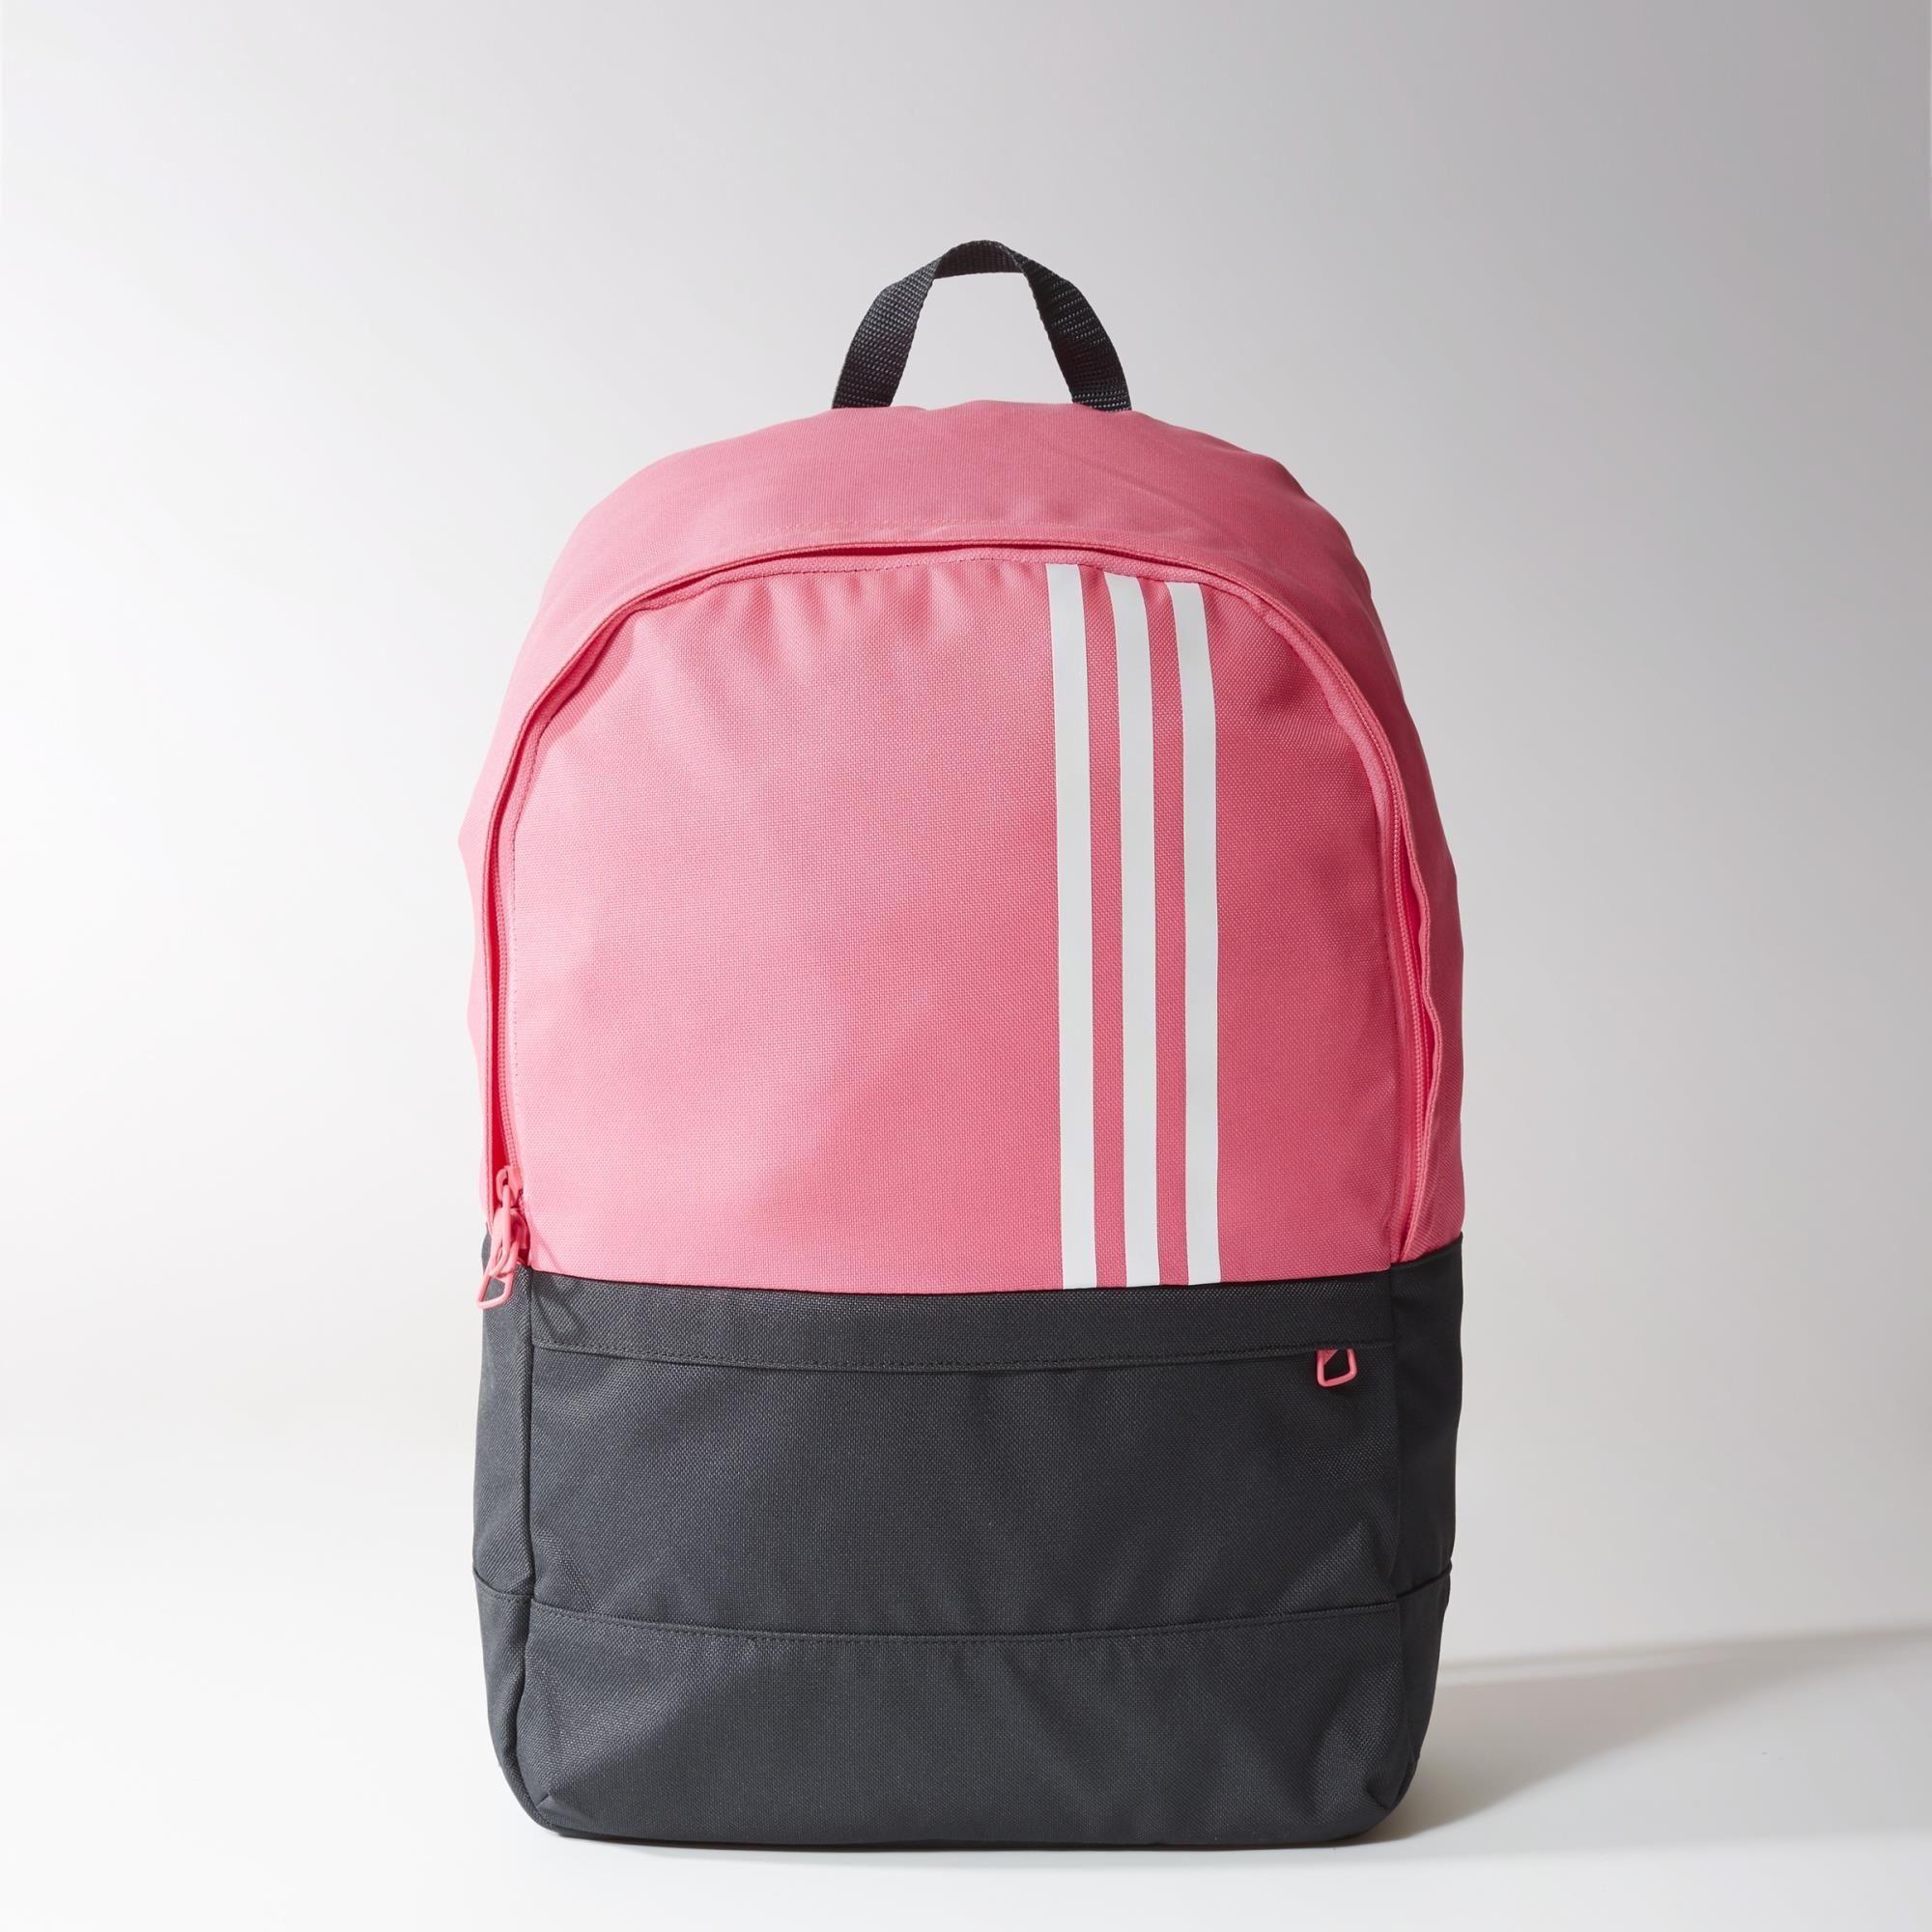 Adidas S22506Backpack Adidas Mochila 2019 En 5LAj4R